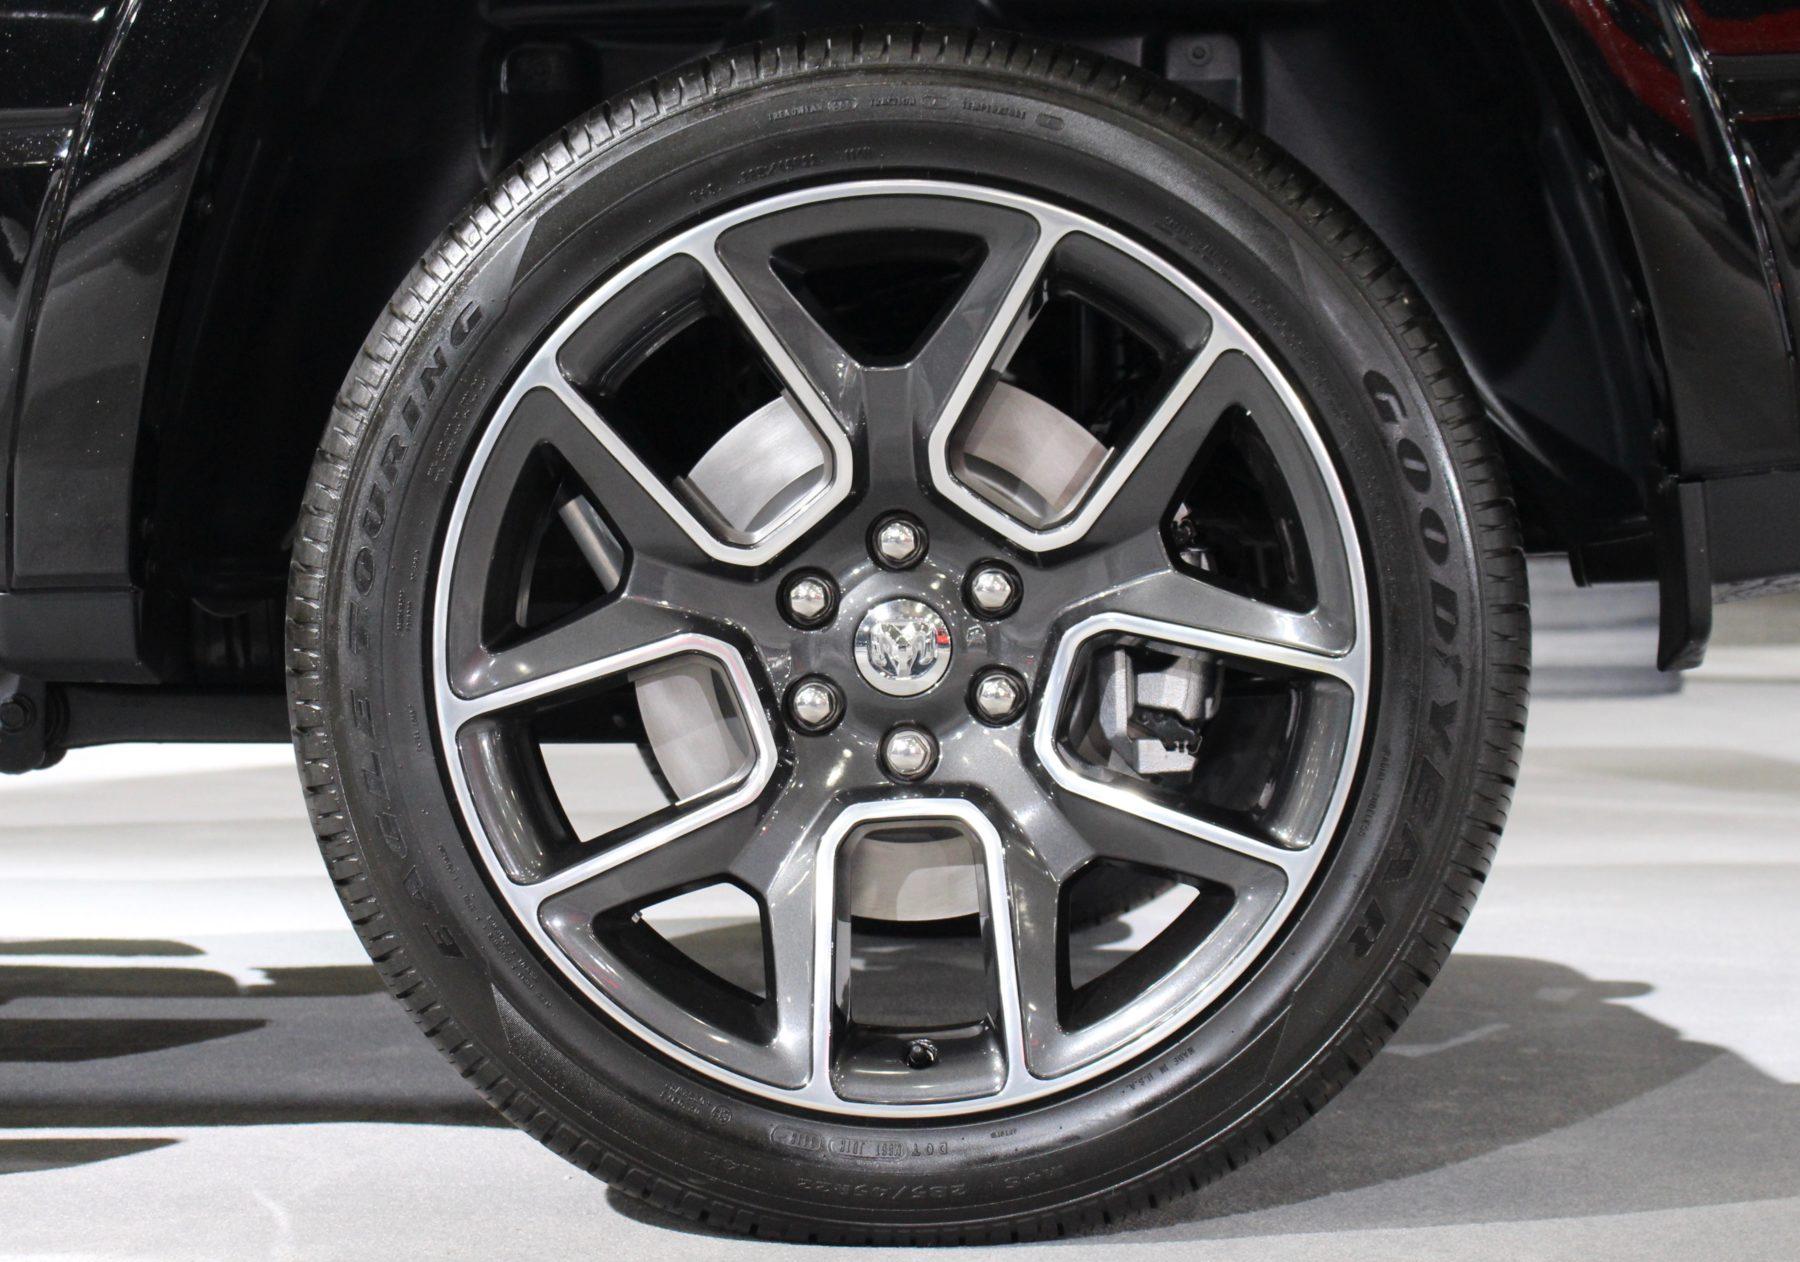 Ram 1500 wheel